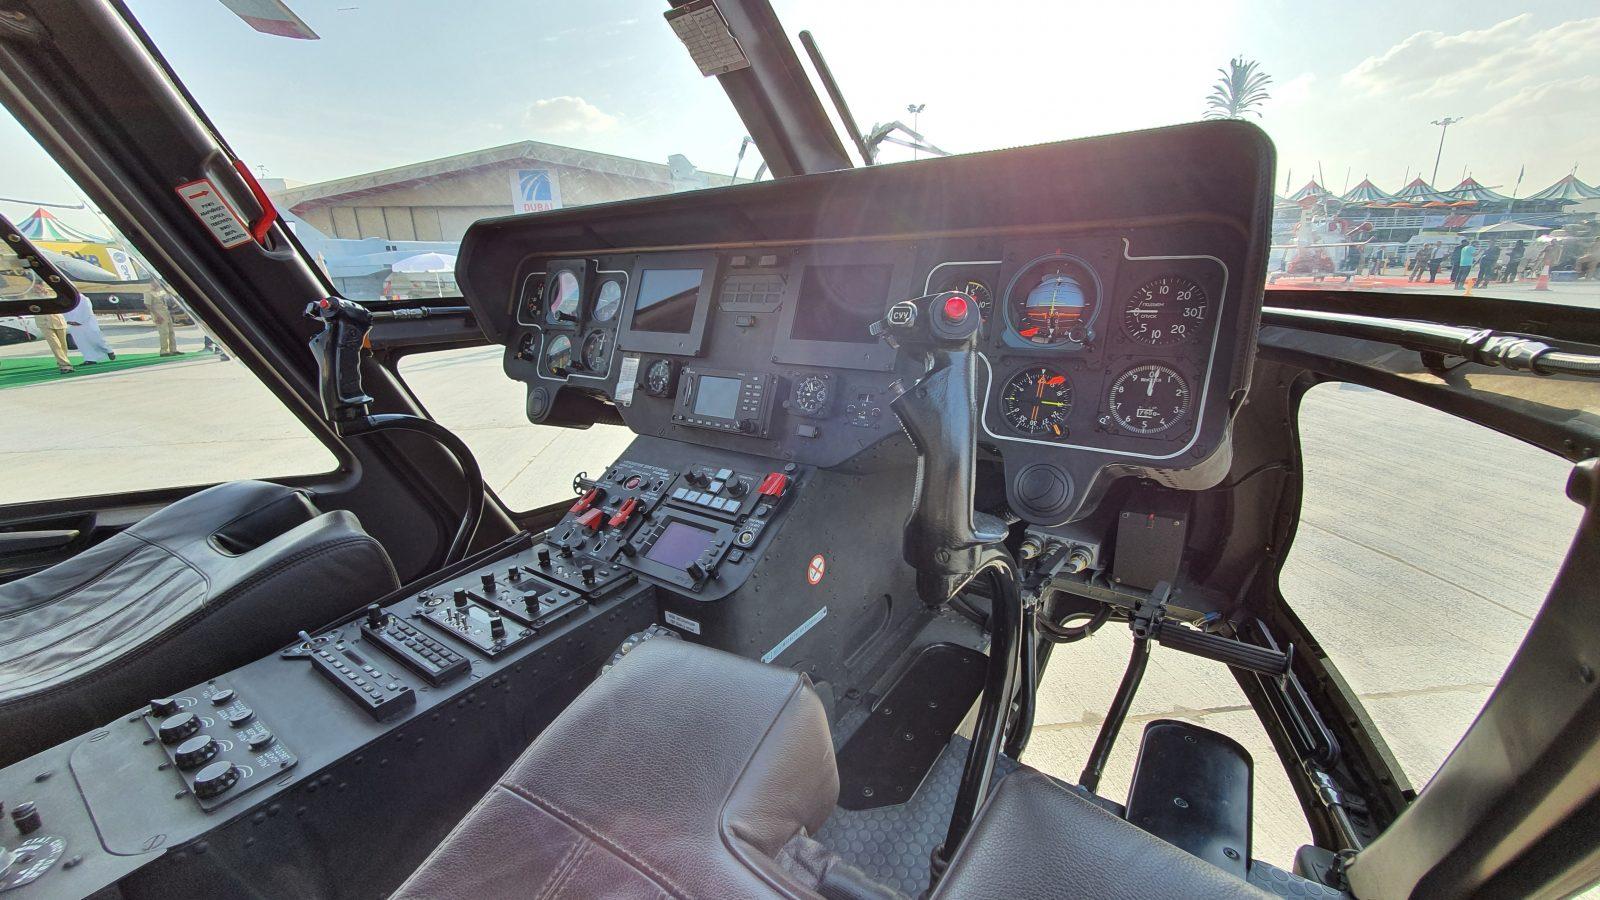 Piloti Republike Srpske dobijaju džabe obuku u Rusiji: Simulator za helikopter Ansat sertifikovan po ICAO standardima